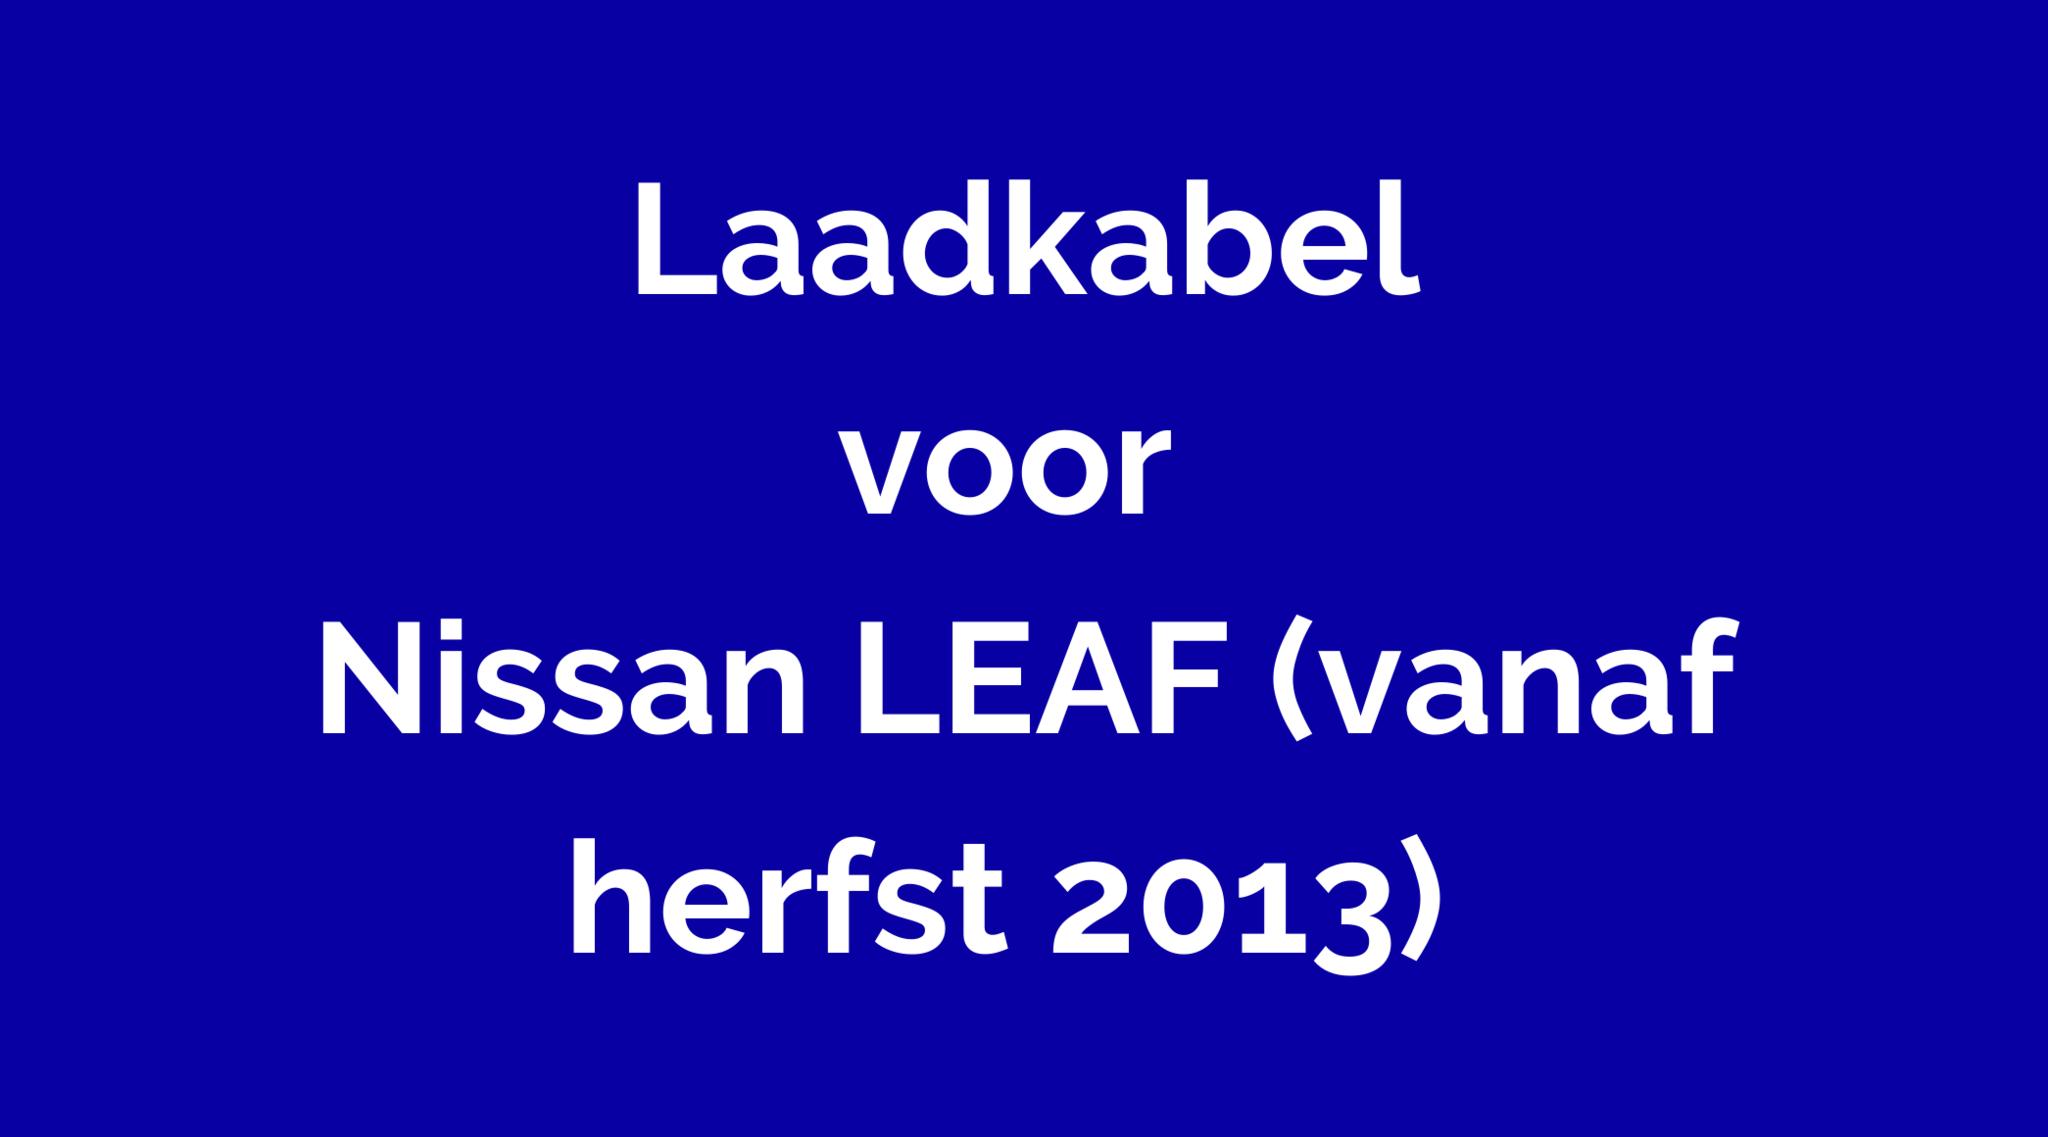 Laadkabel voor Nissan LEAF (vanaf herfst 2013)